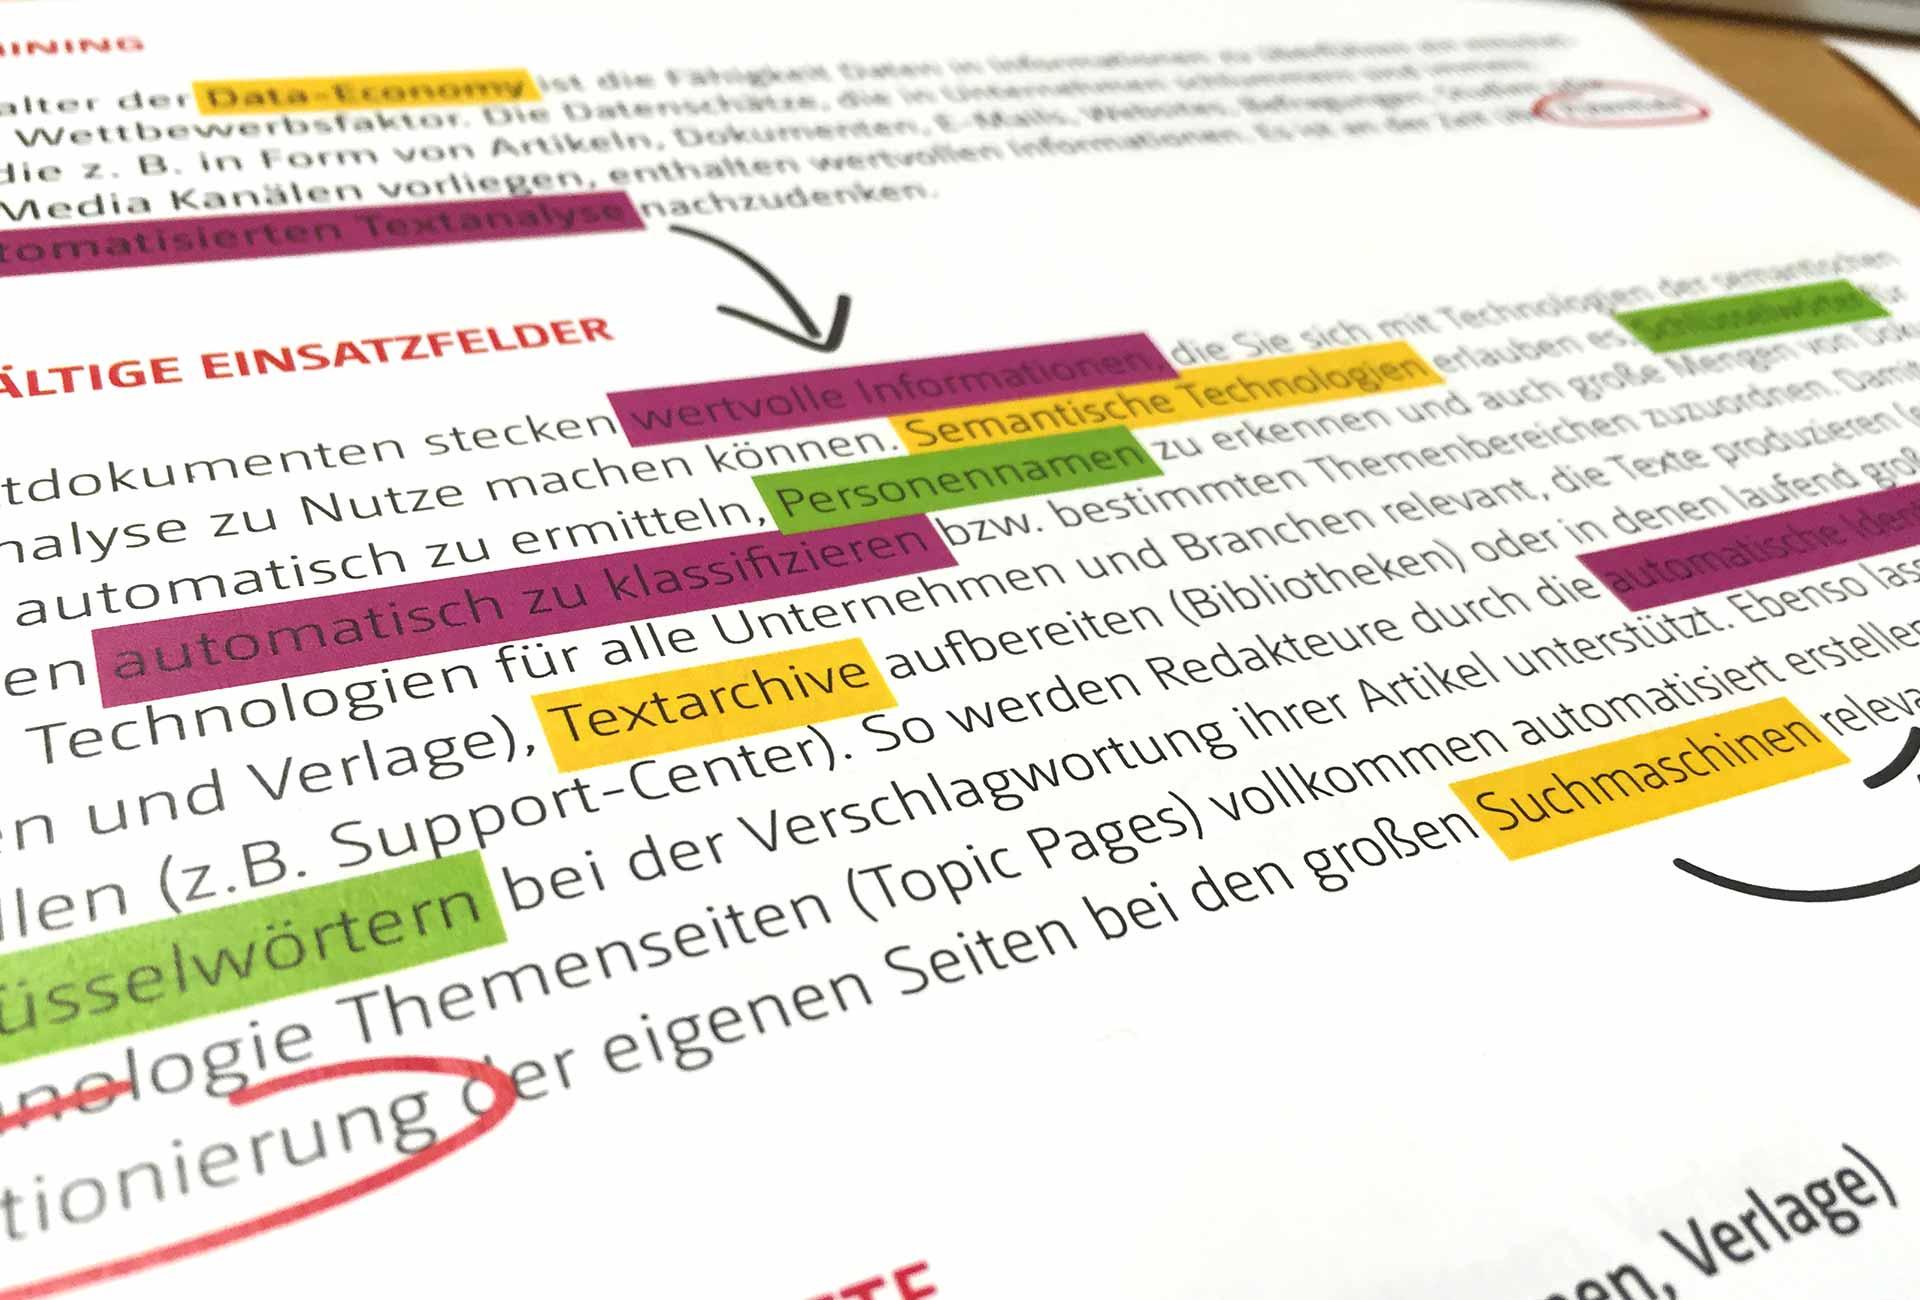 Textanalyse Neofonie